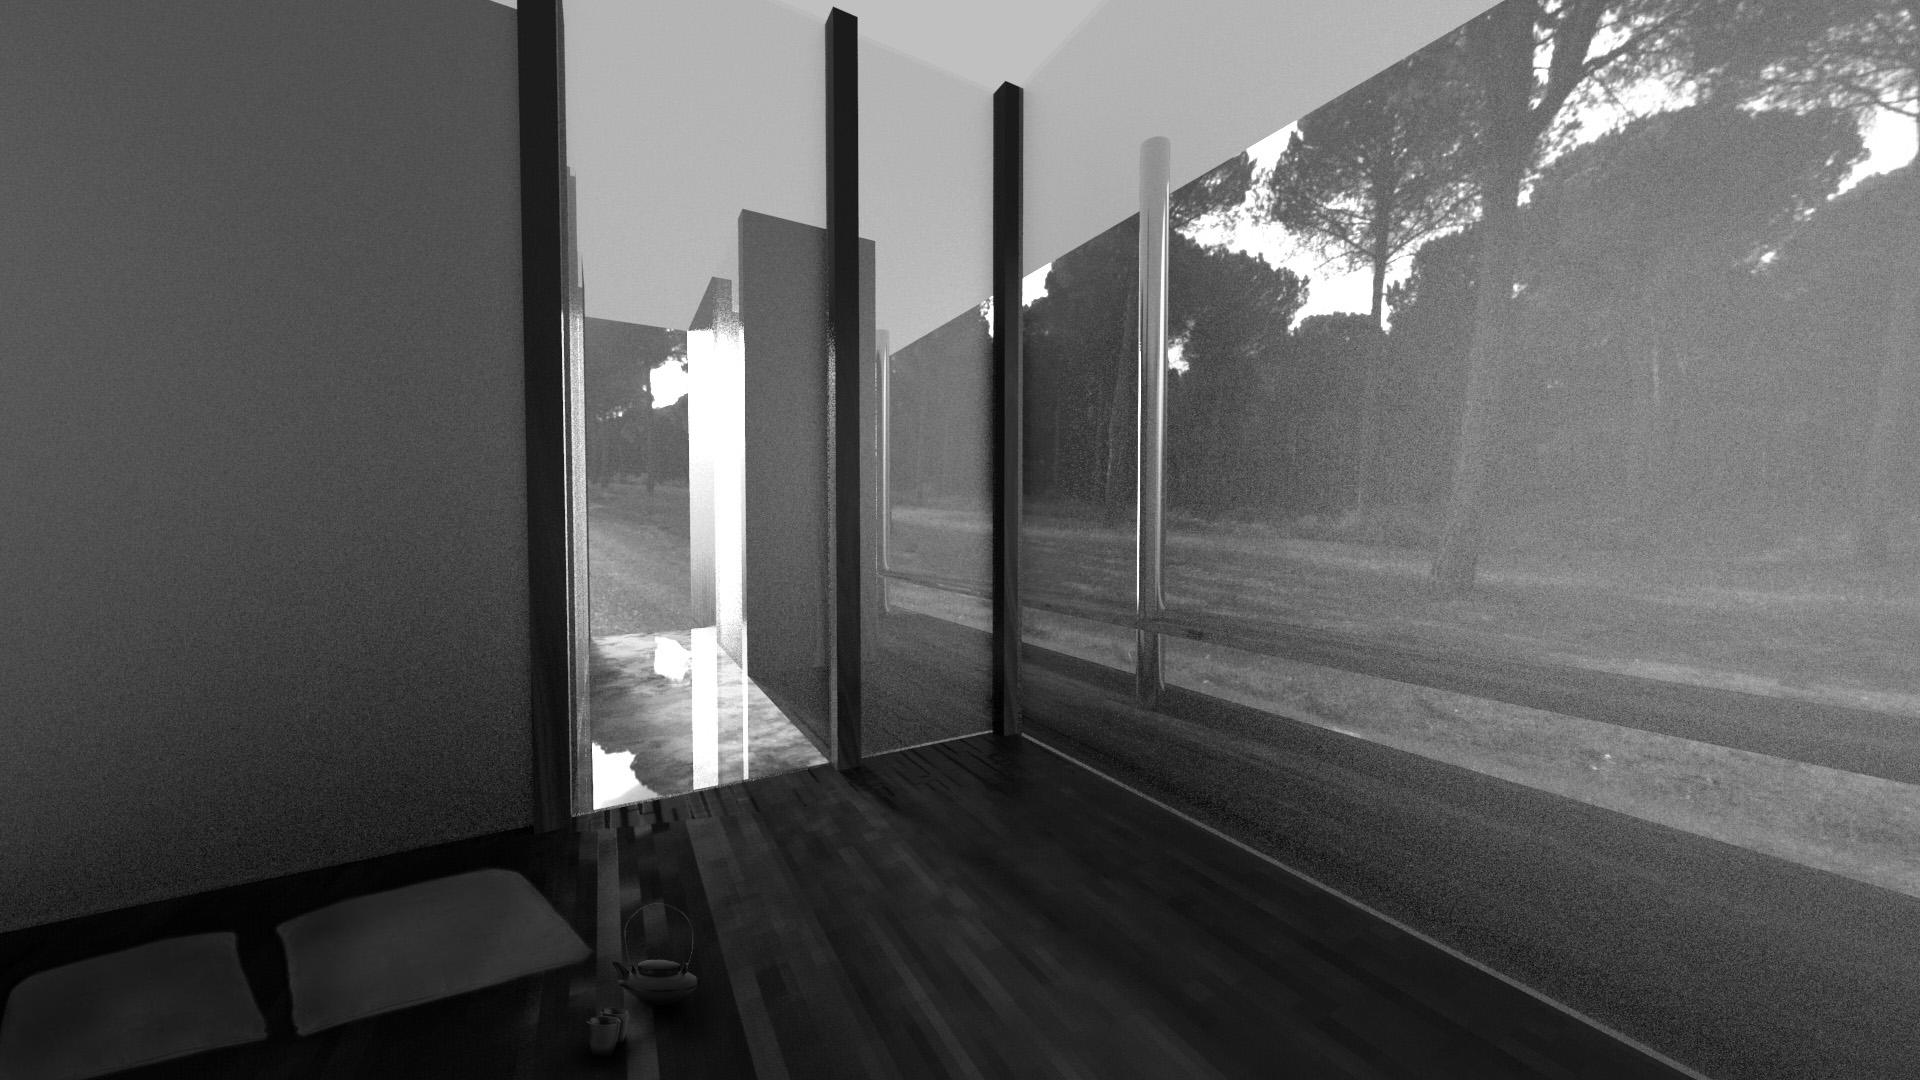 130814_bath house_meditation room 1_kl.jpg